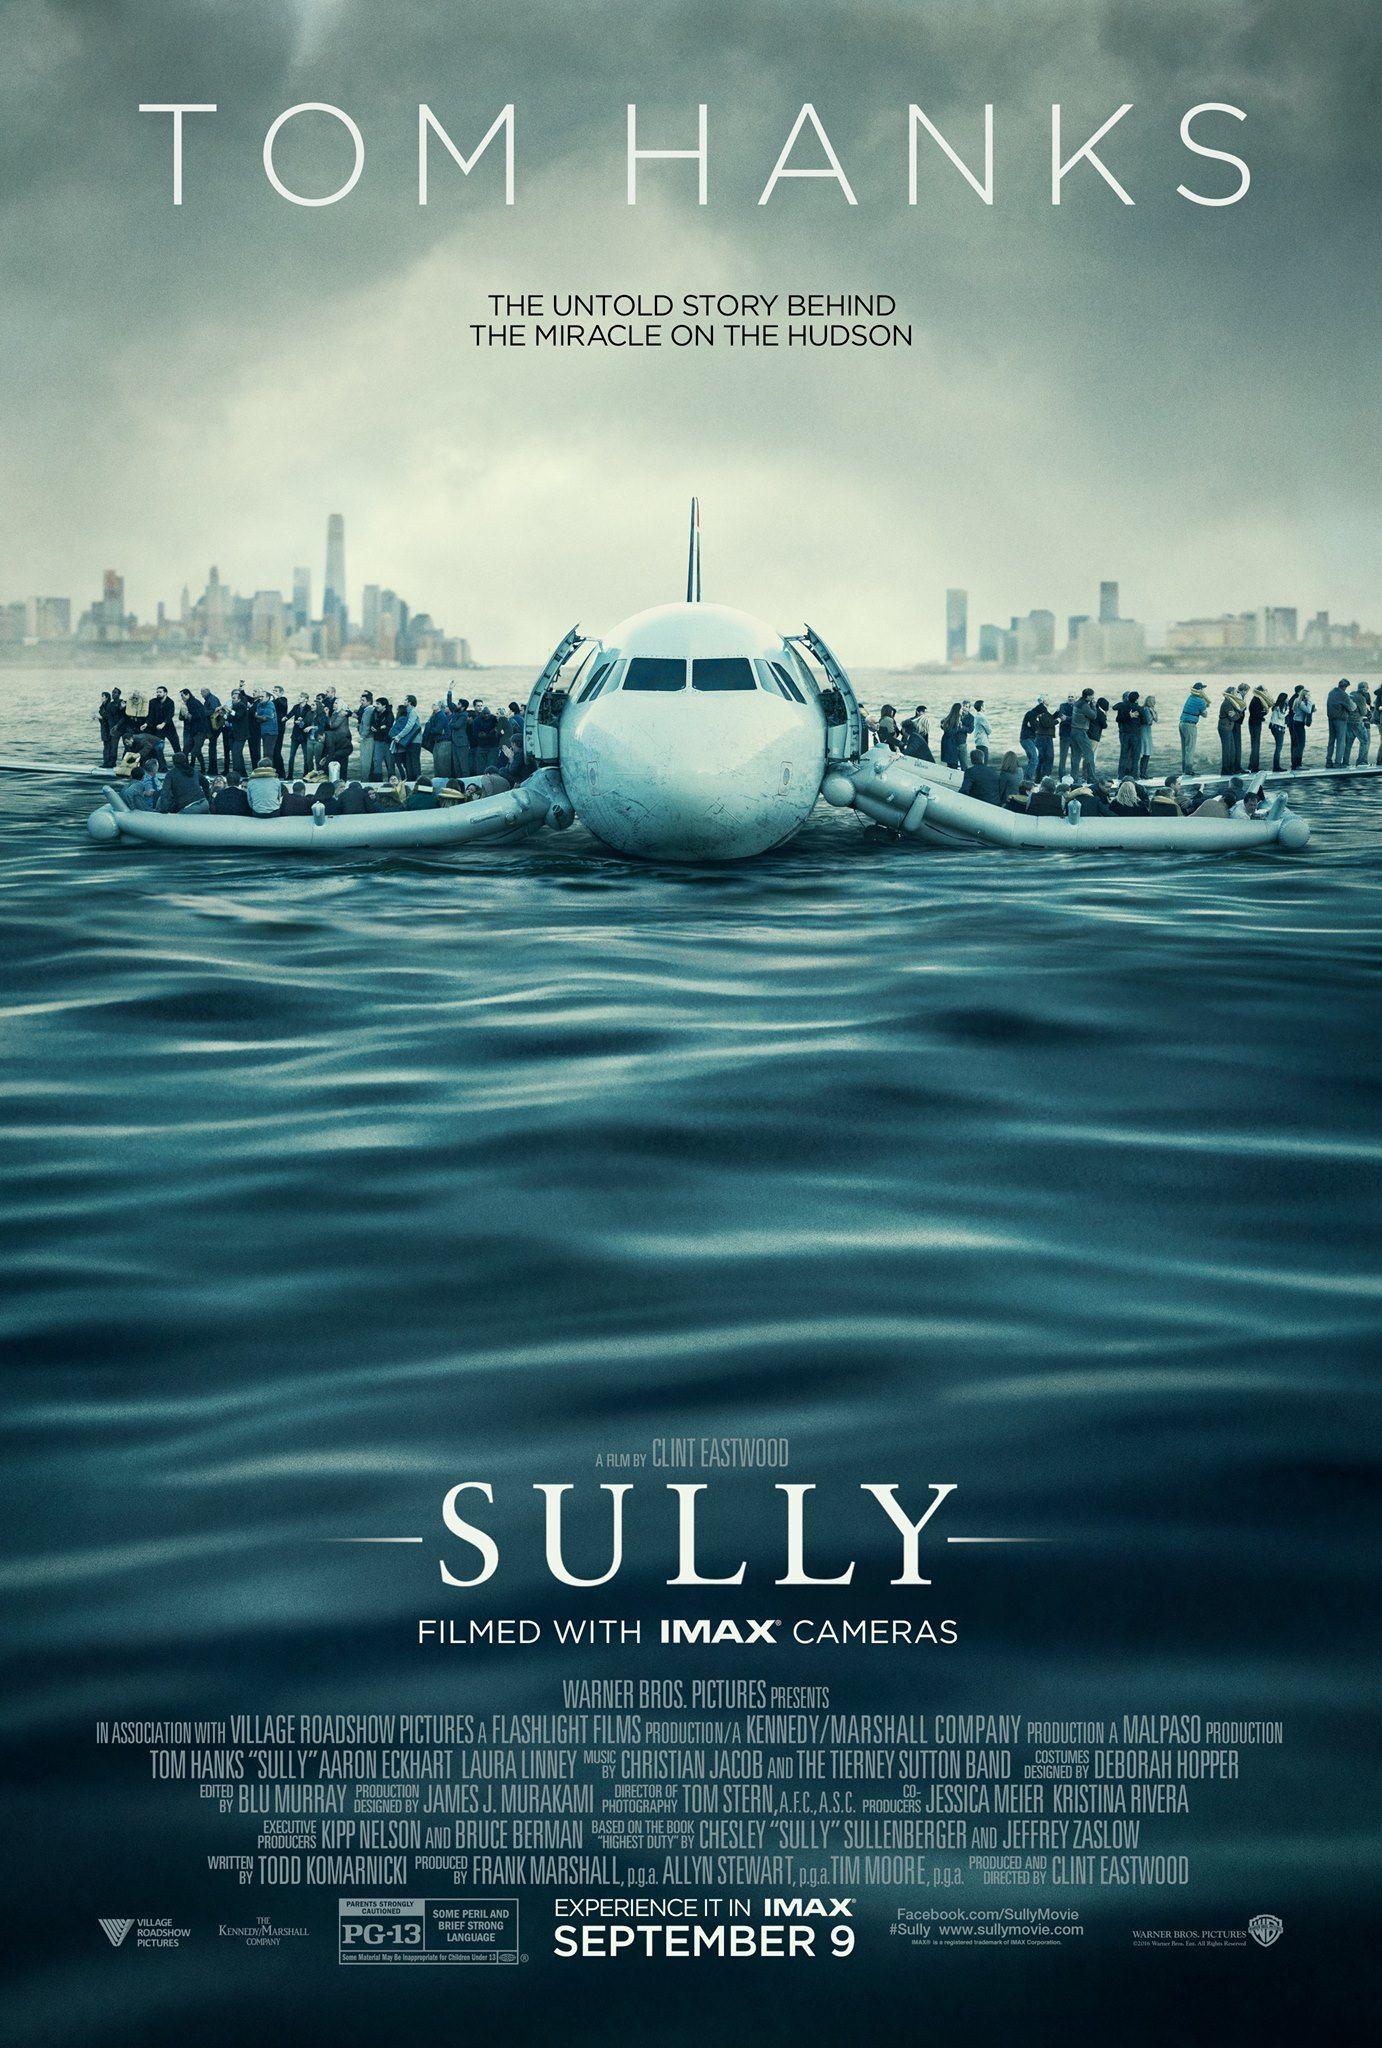 SULLY starring Tom Hanks In theaters & IMAX September 9